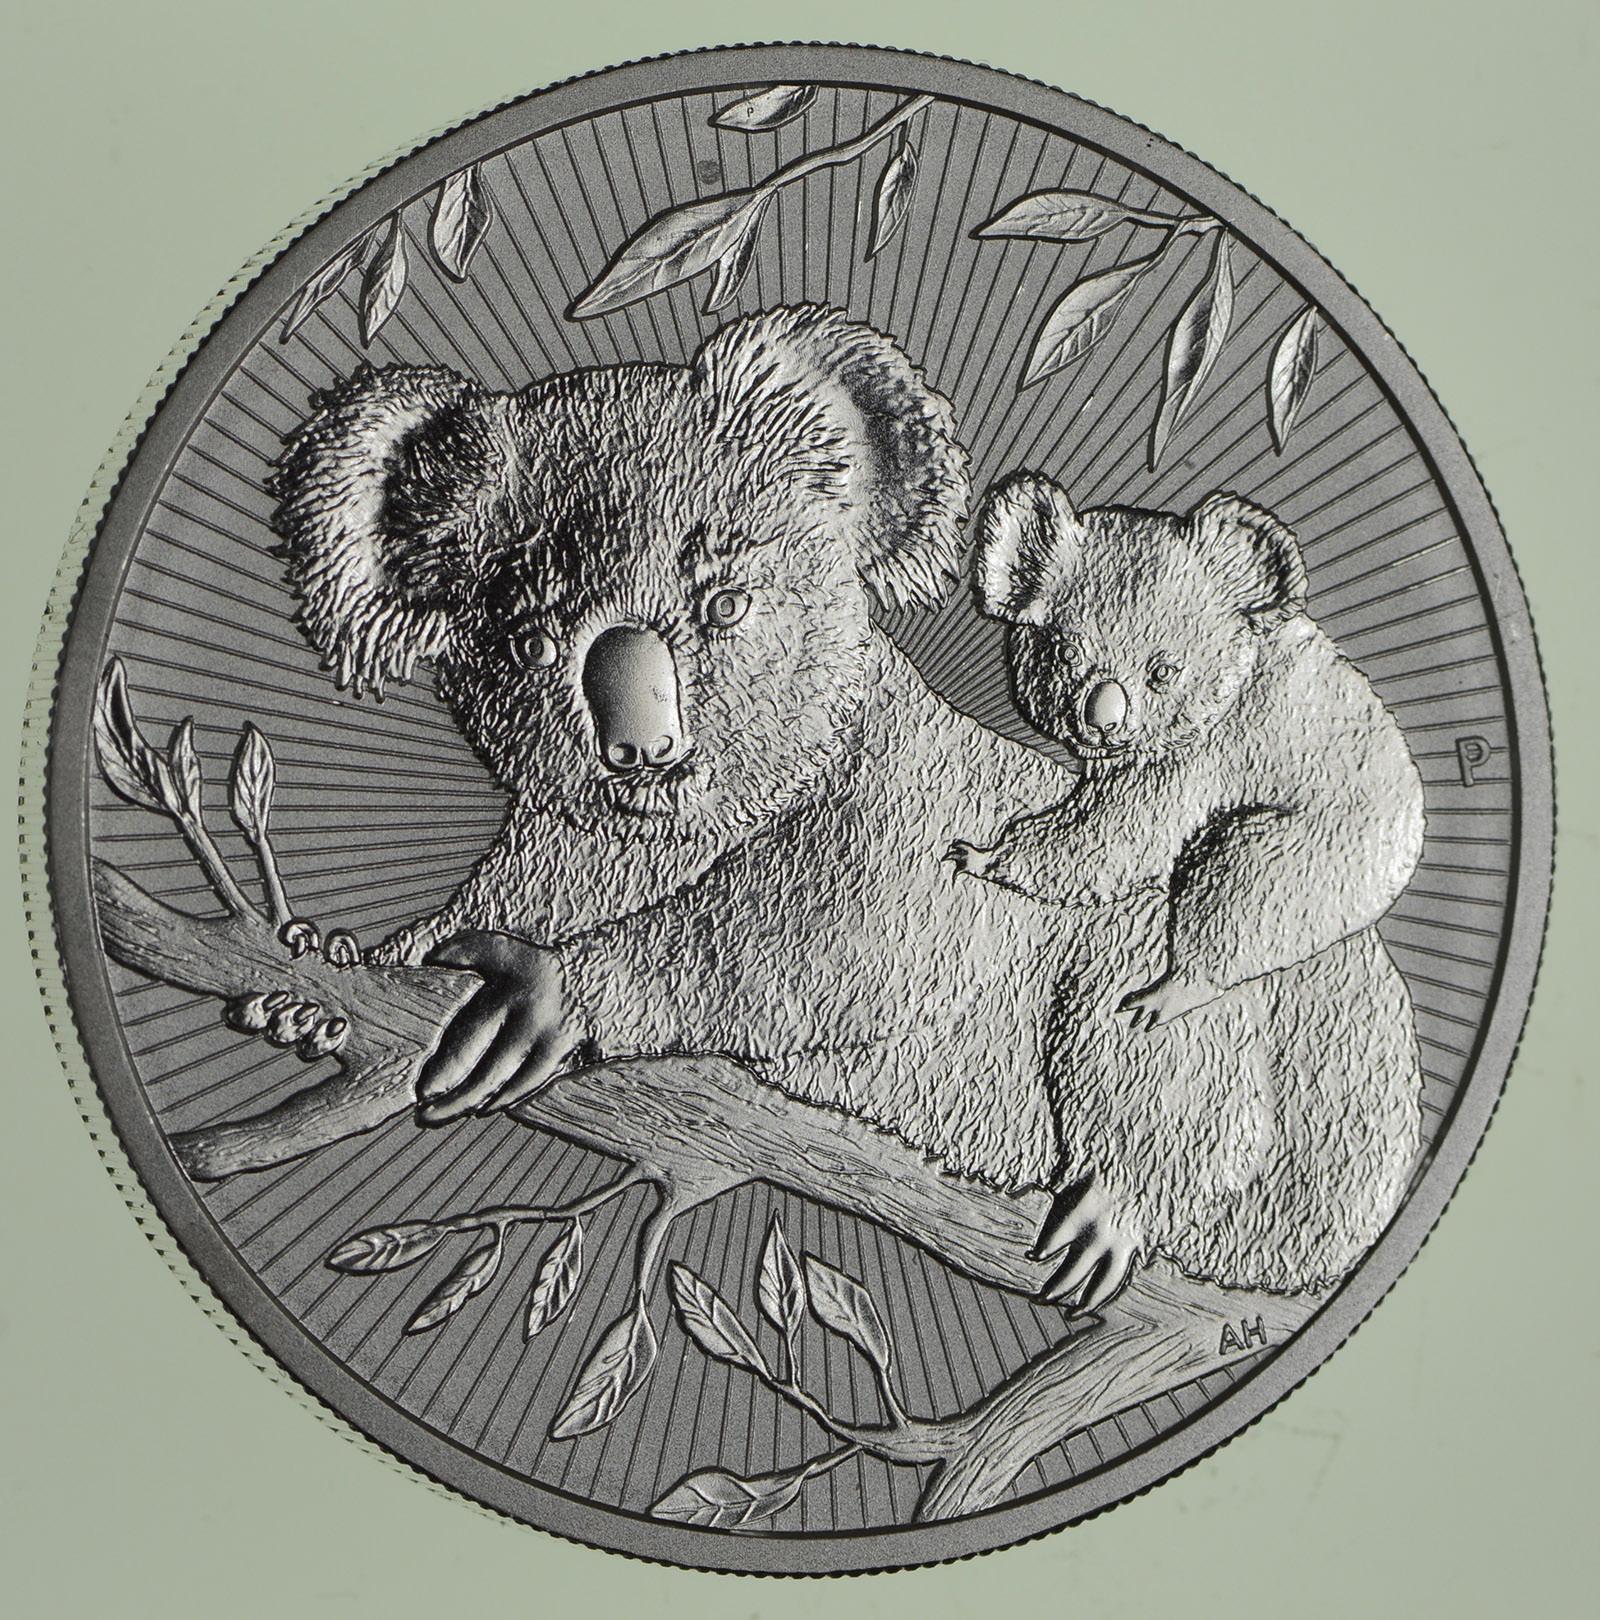 Australian Koala Next Generation BU coin .9999 ultra fine silver 2018 2 oz